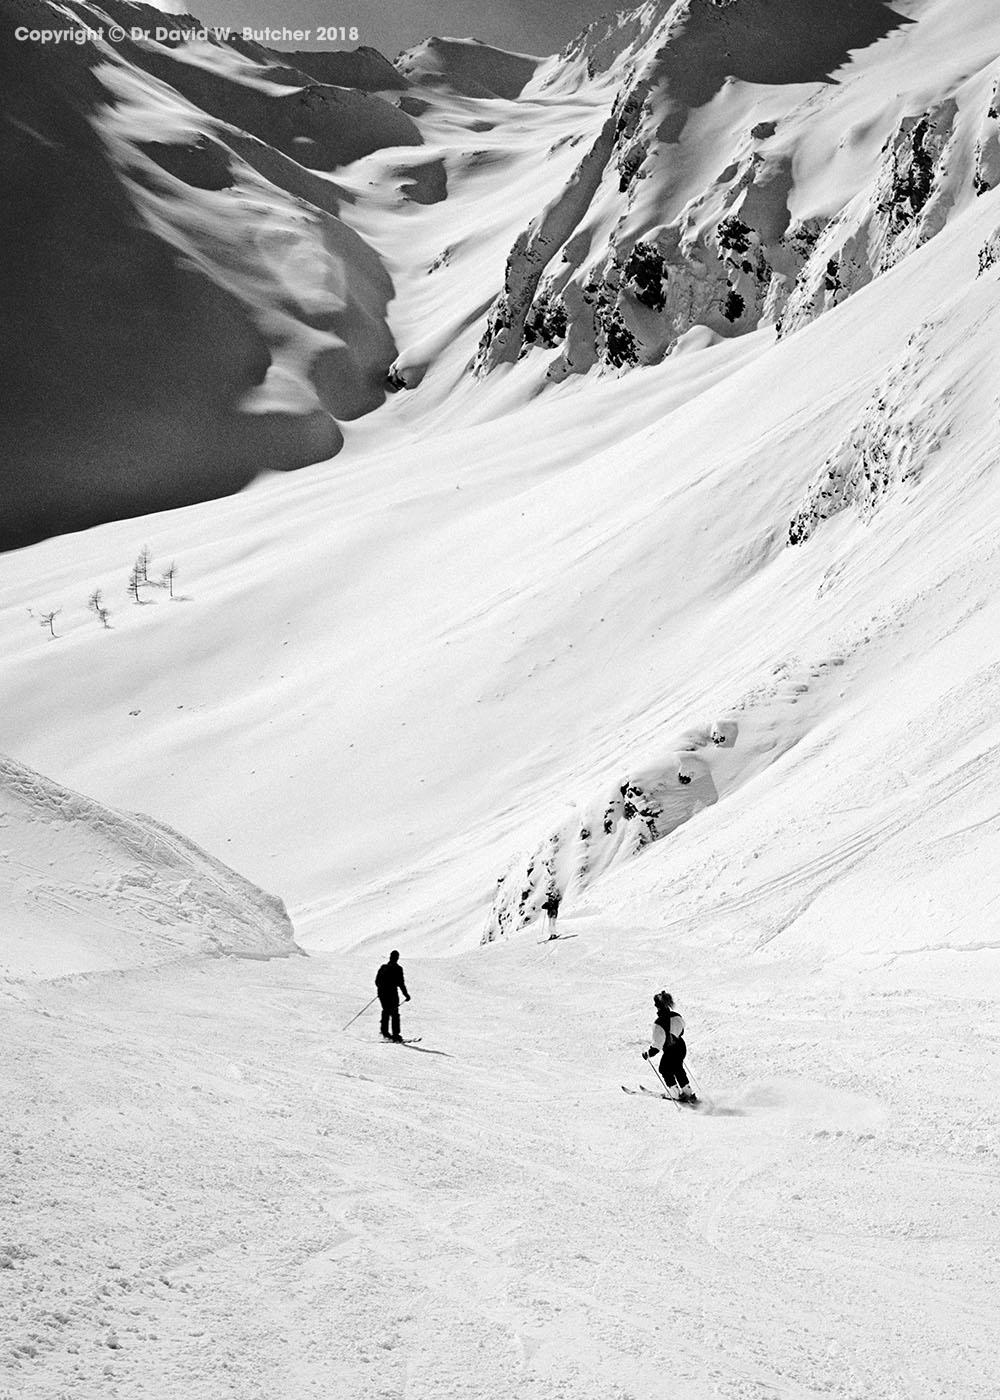 Ski run from Ischgl in the Austrian Tyrol to Samnaun in Switzerland by Dave Butcher